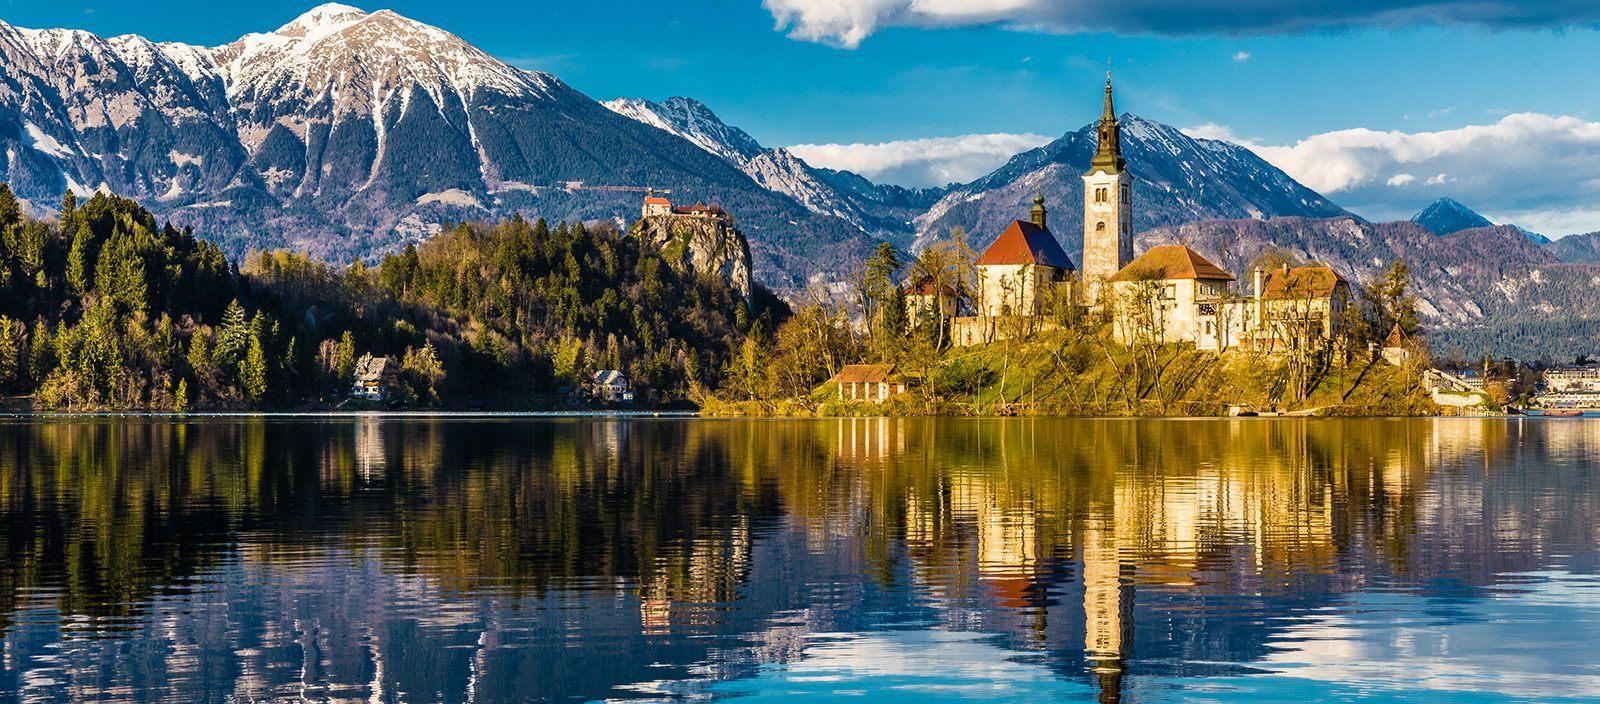 Hiking the Alpe-Adria Trail through Austria, Slovenia, and Italy